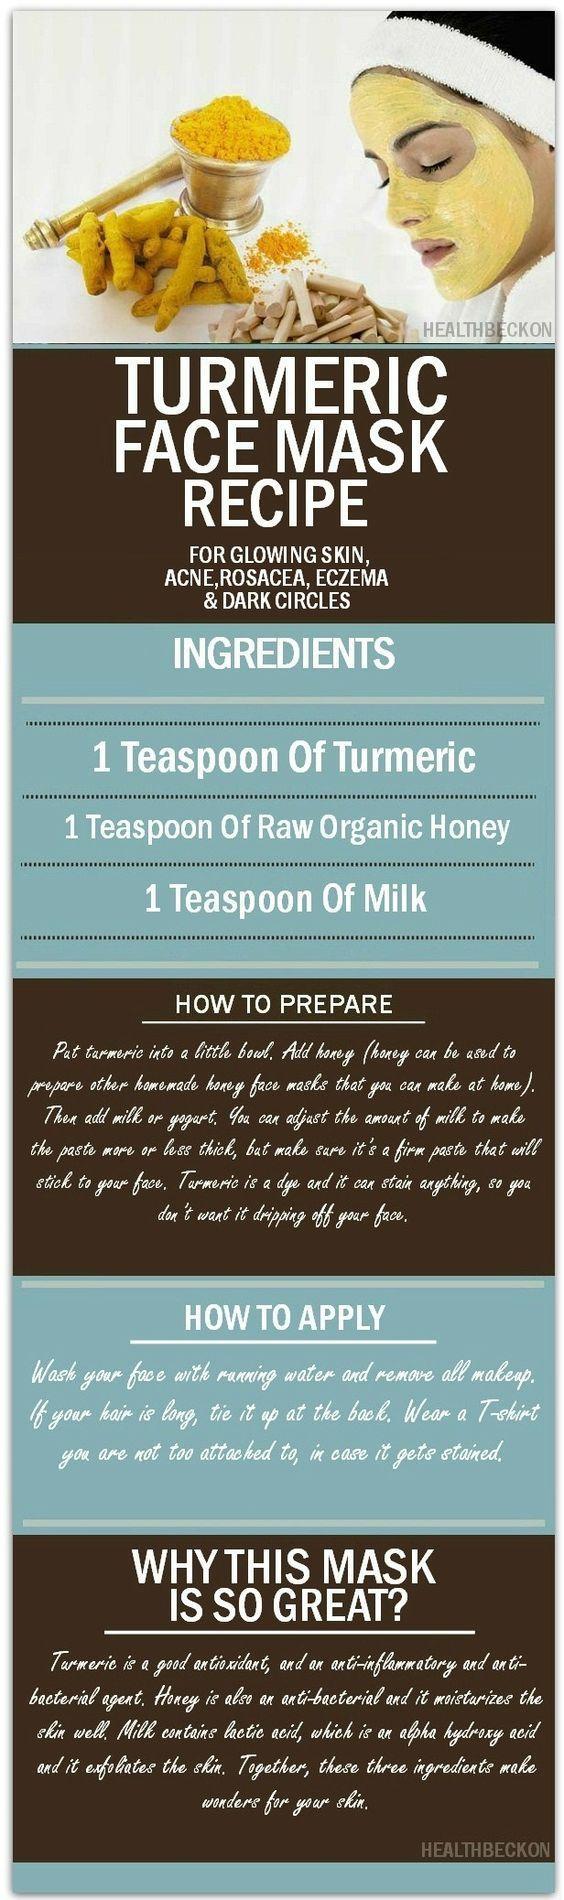 Turmeric Face Mask Recipe for Glowing Skin, Acne, Rosacea, Eczema and Dark Circles @larisanilow7: